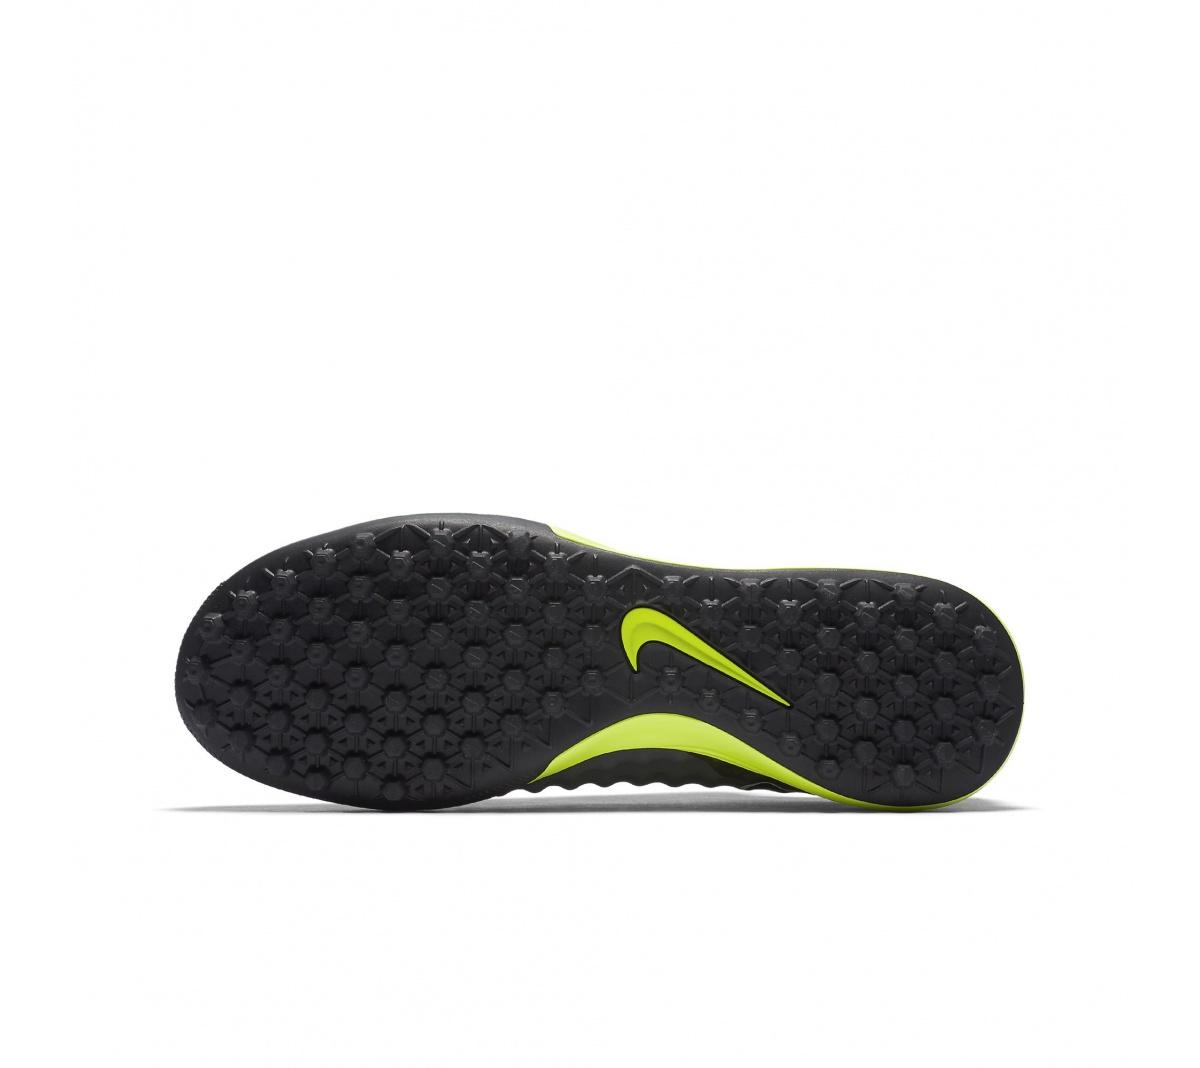 Chuteira Nike Magistax Finale Society New Cinza com Verde - Mundo do ... c227bb123dc81